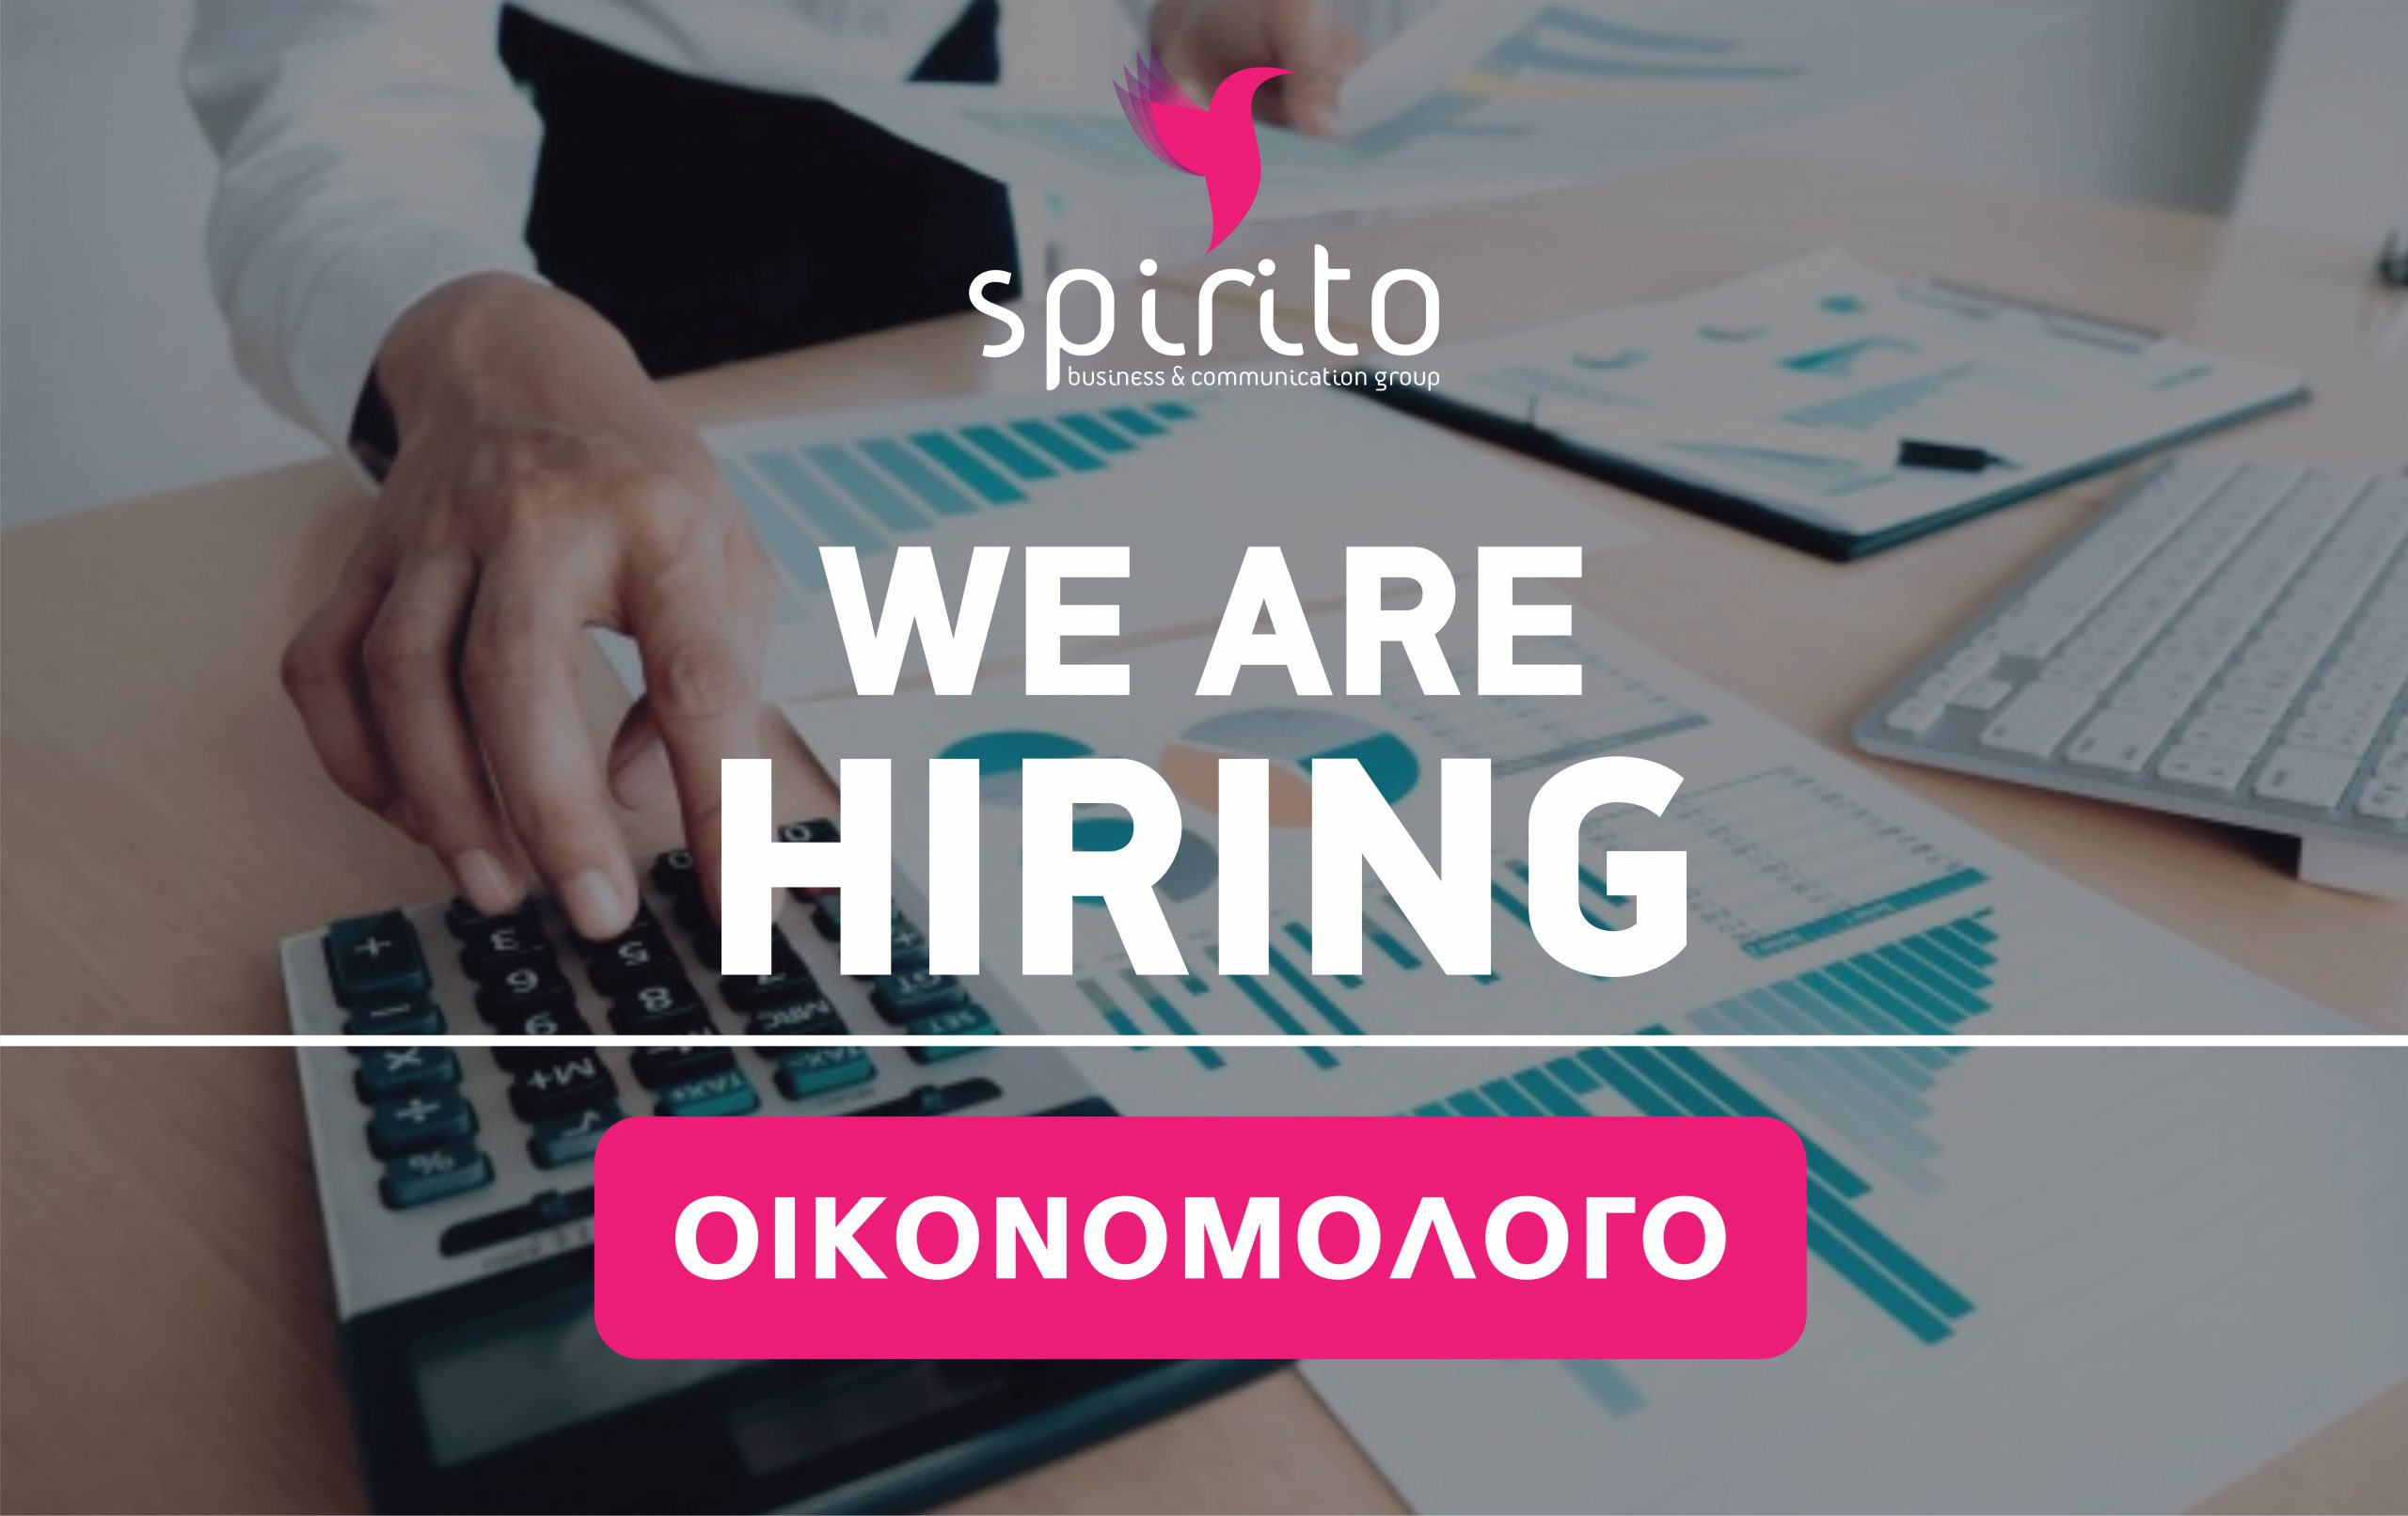 spirito we are hiring oikonomologo scaled